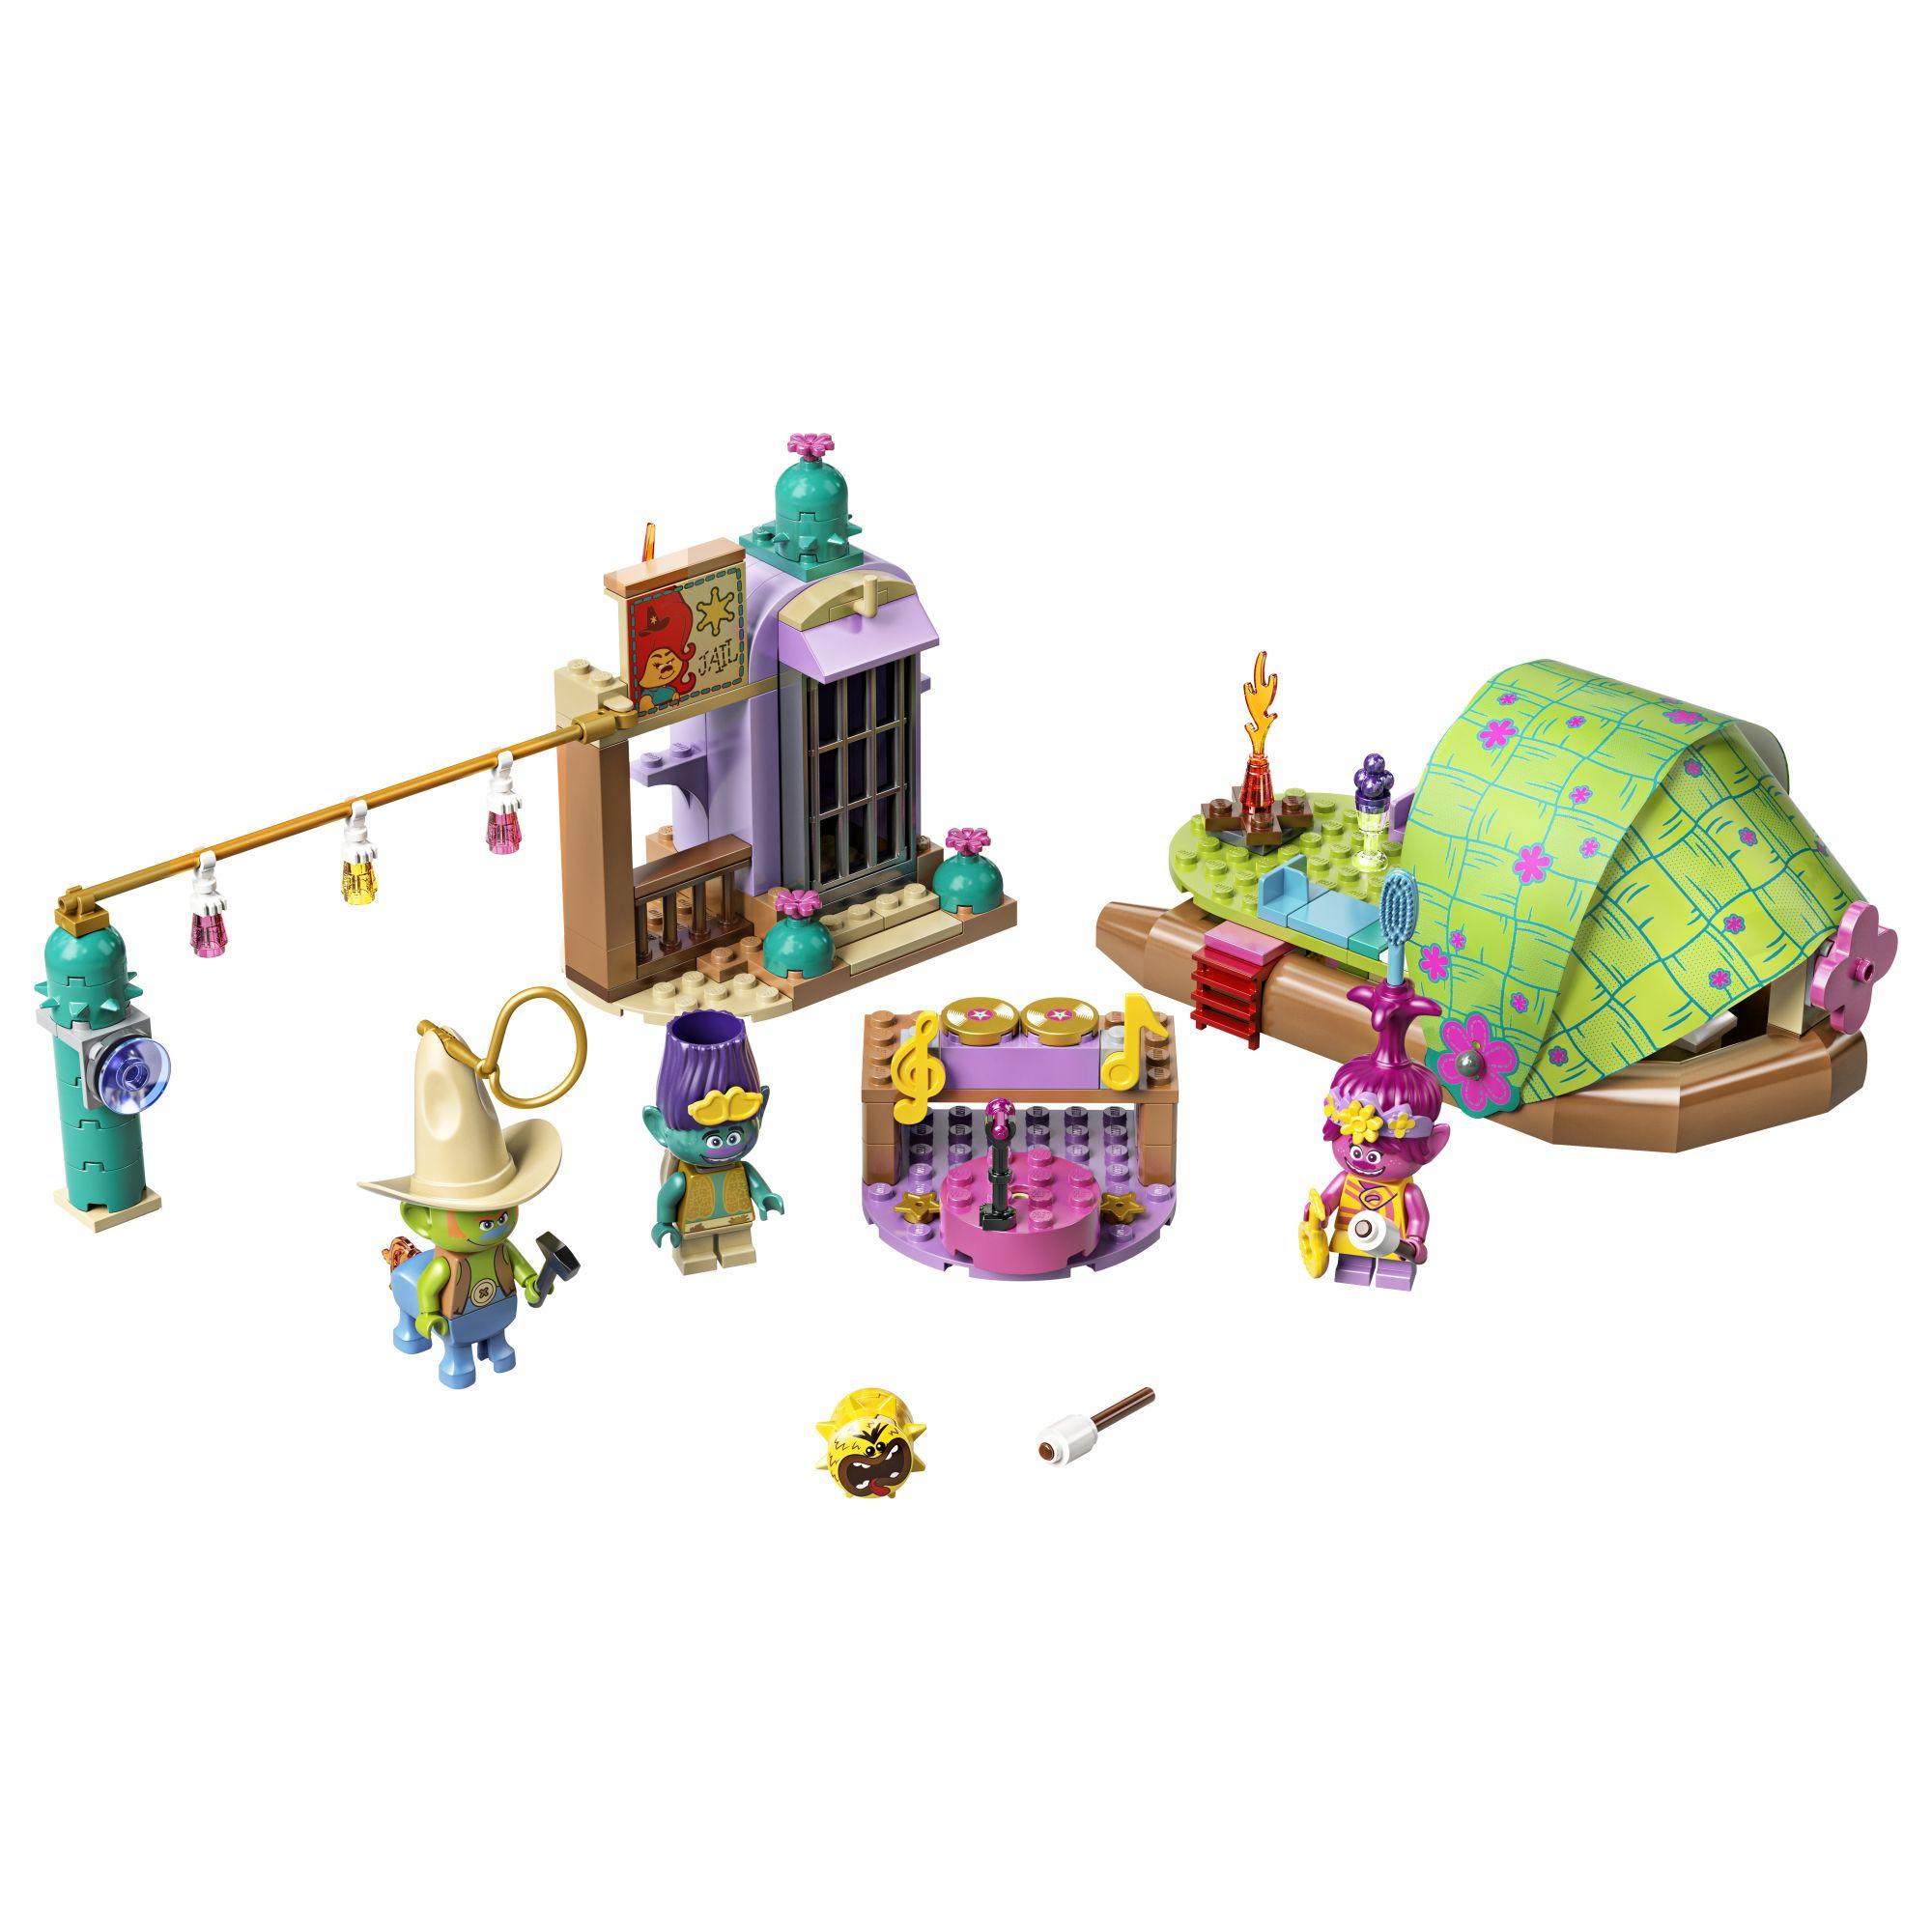 LEGO Trolls Avventura sulla zattera a Lonesome Flats - 41253